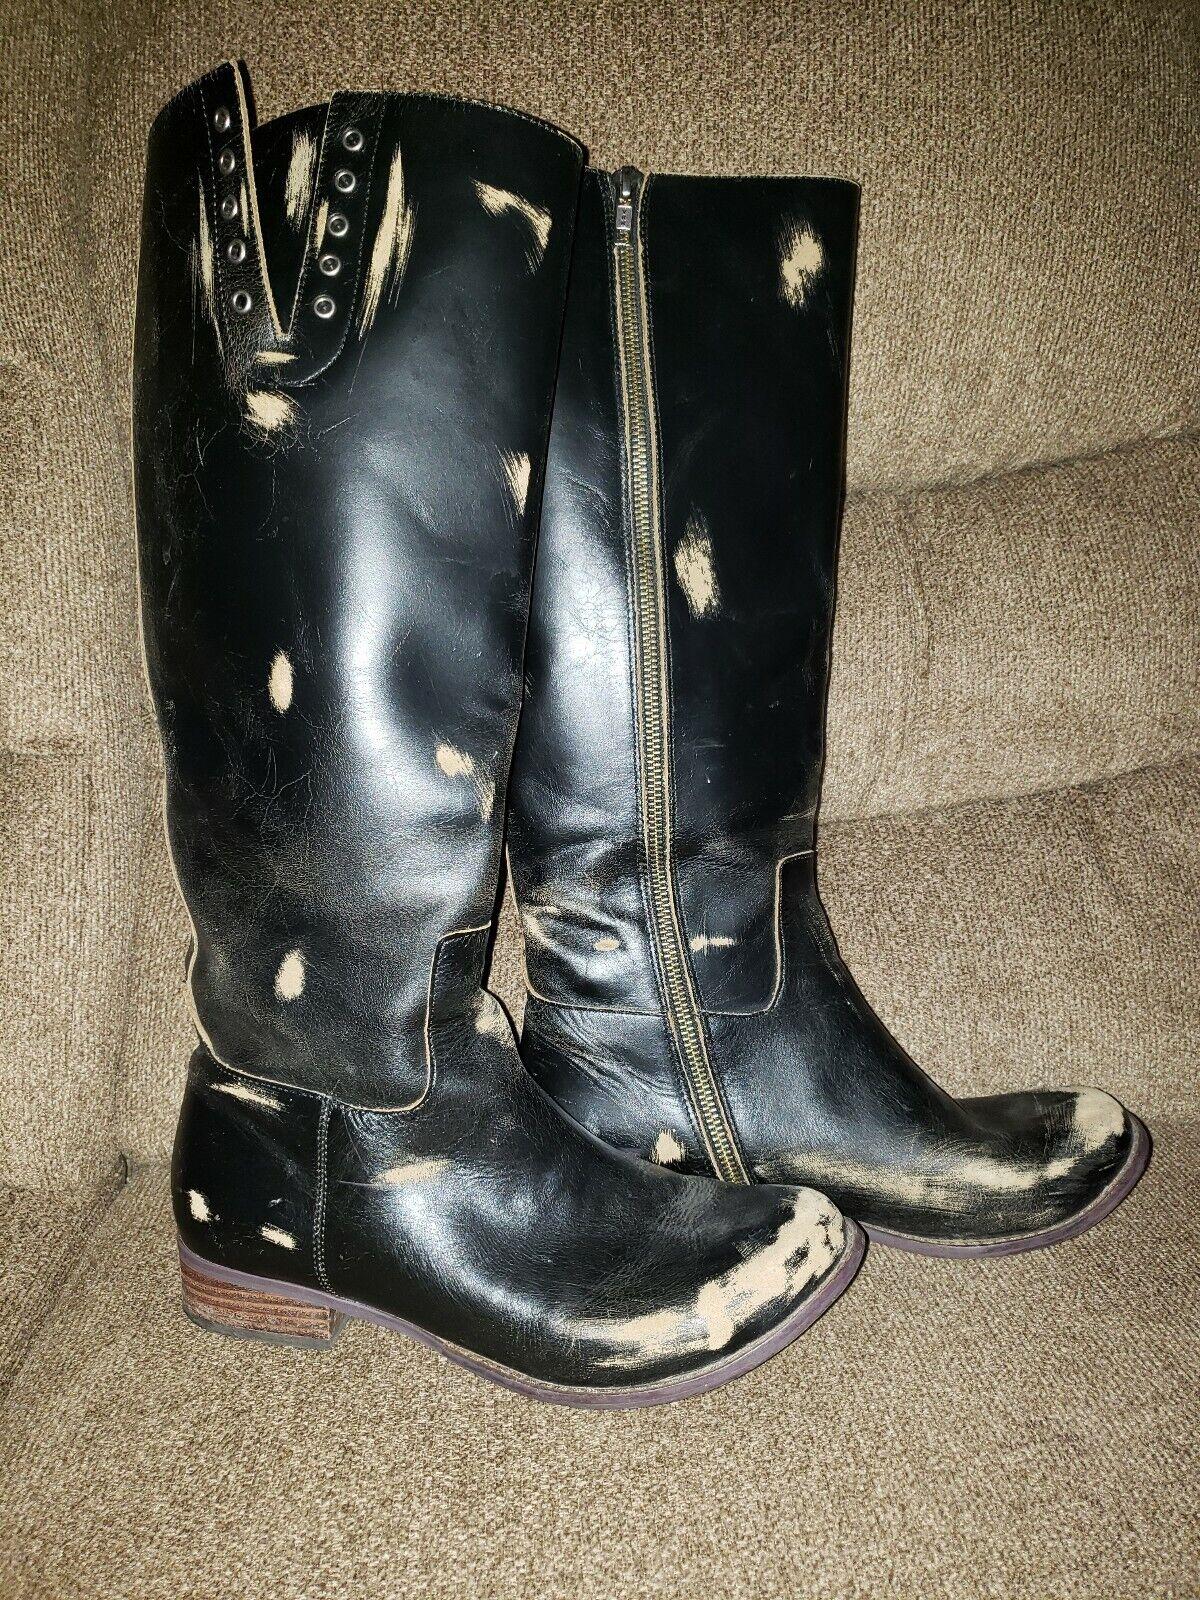 FREE PEOPLE FARYL ROBIN tall  Boots 10 black Distressed Grunge zipper